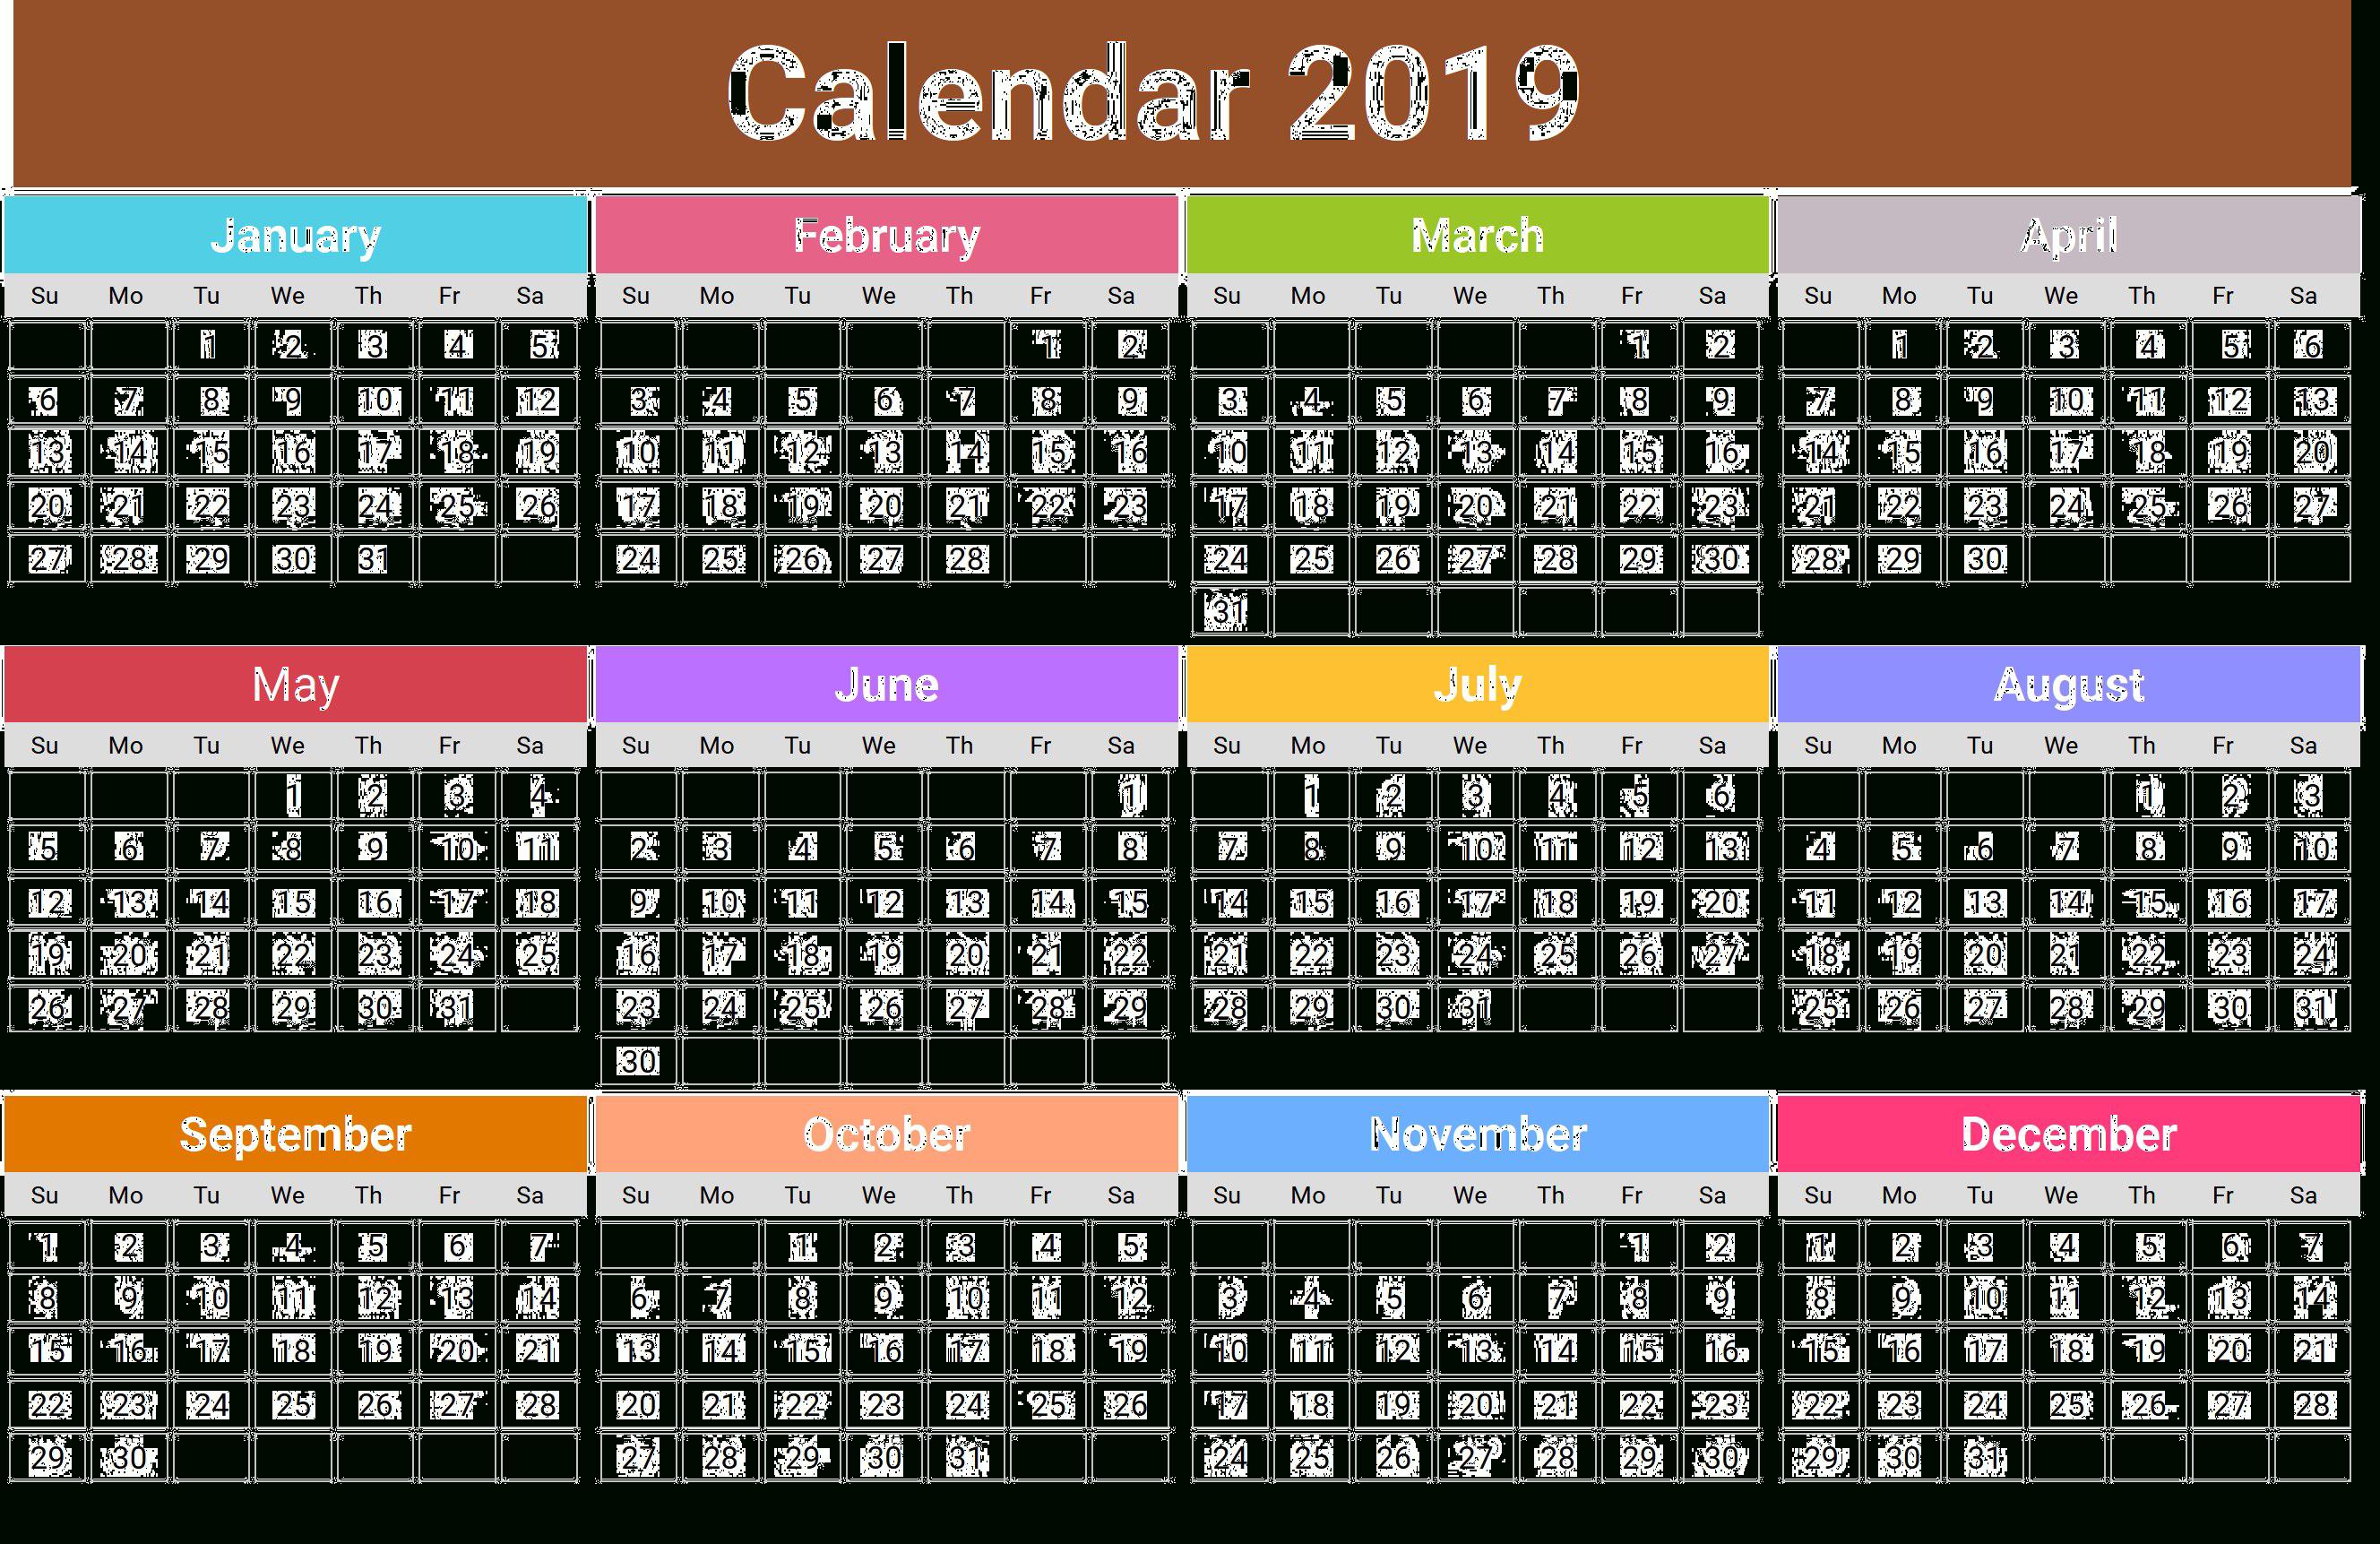 2019 Calendar Png Transparent Images | Png All Calendar 2019 Images